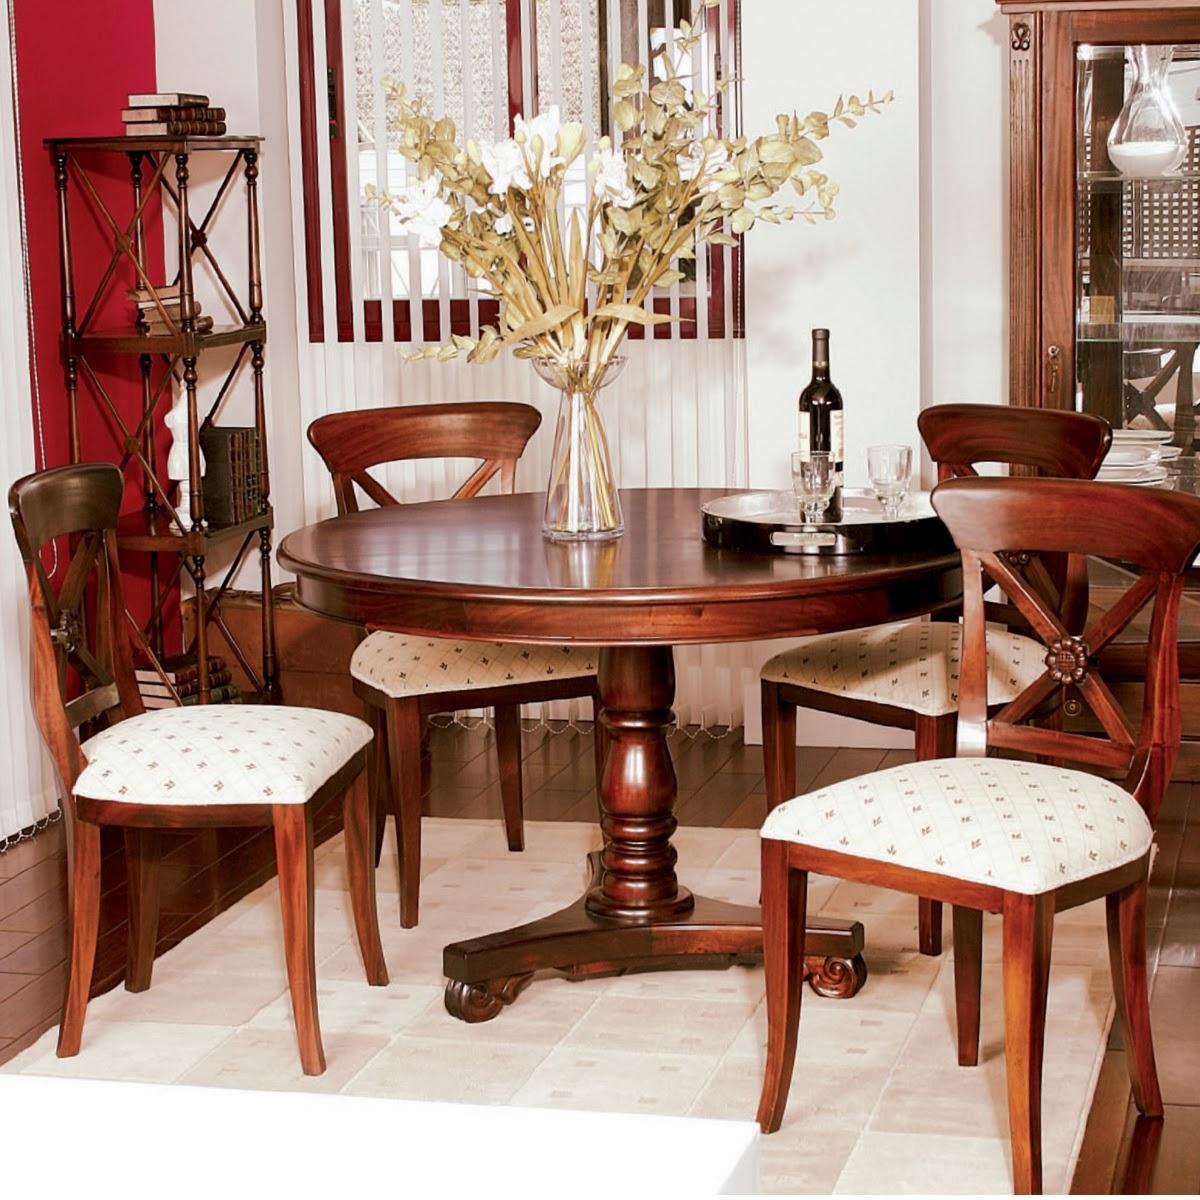 Muebles de comedor 5 comedores clasicos en caoba - Comedores clasicos ...